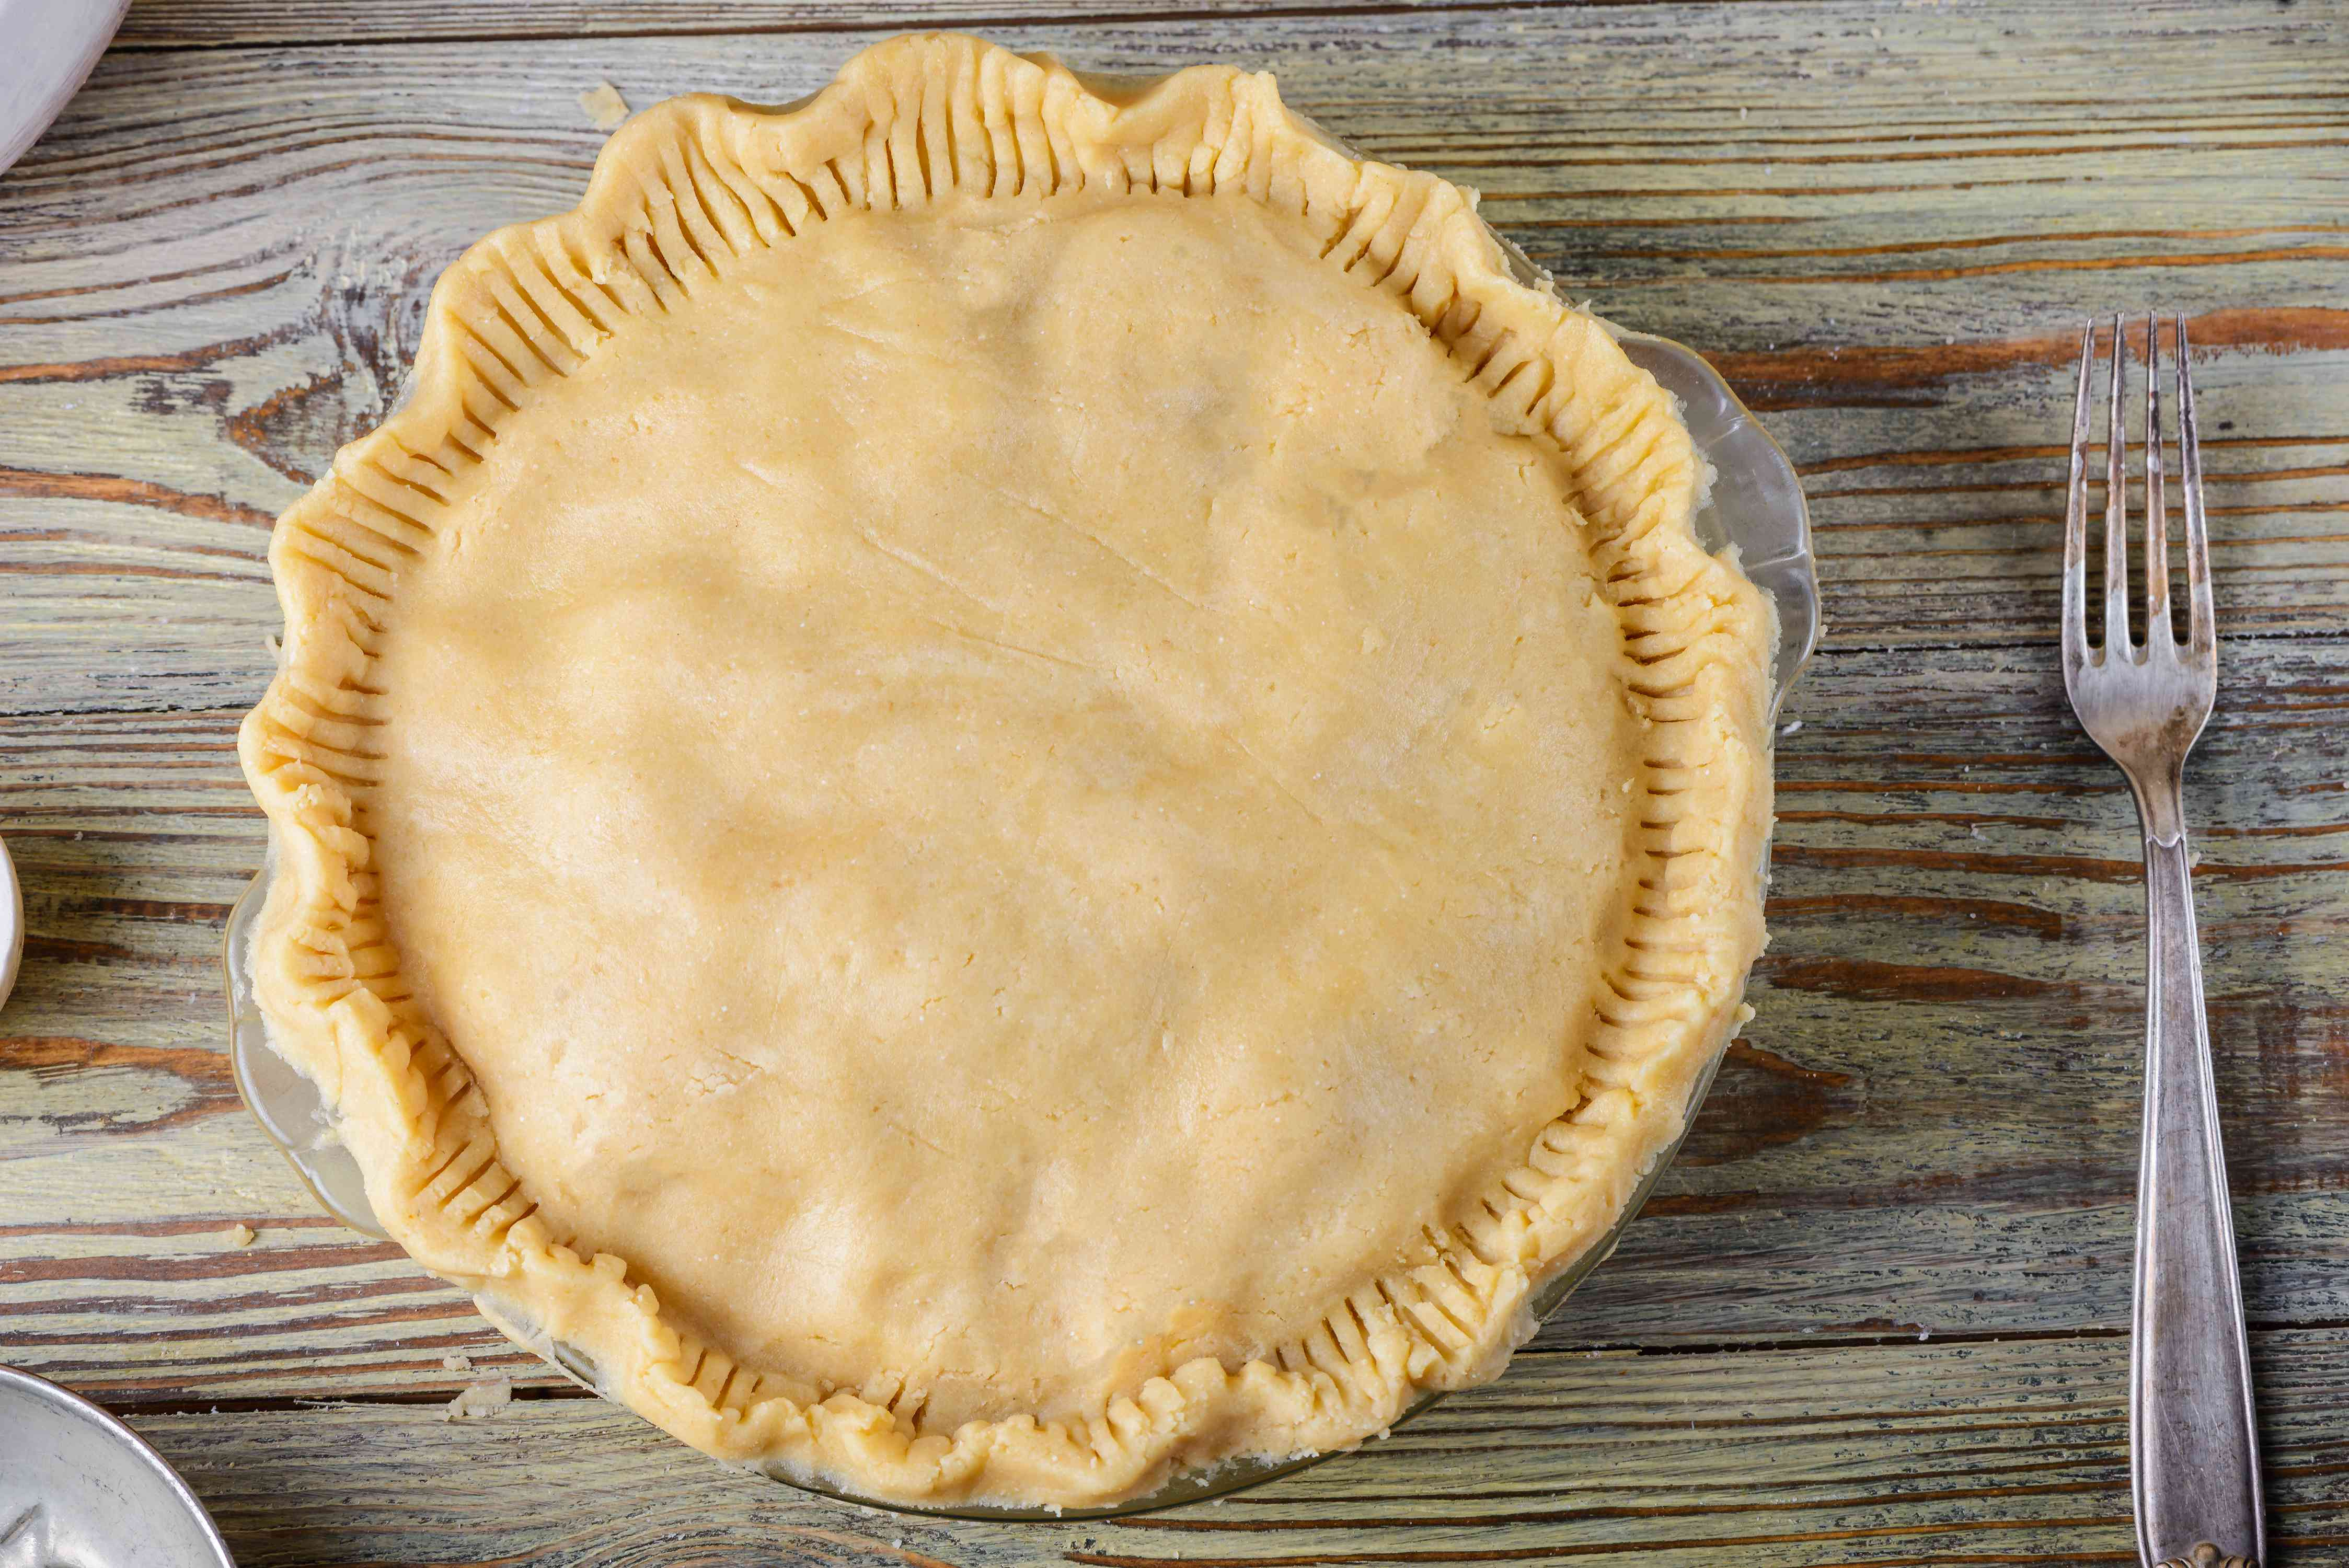 Put dough over pie